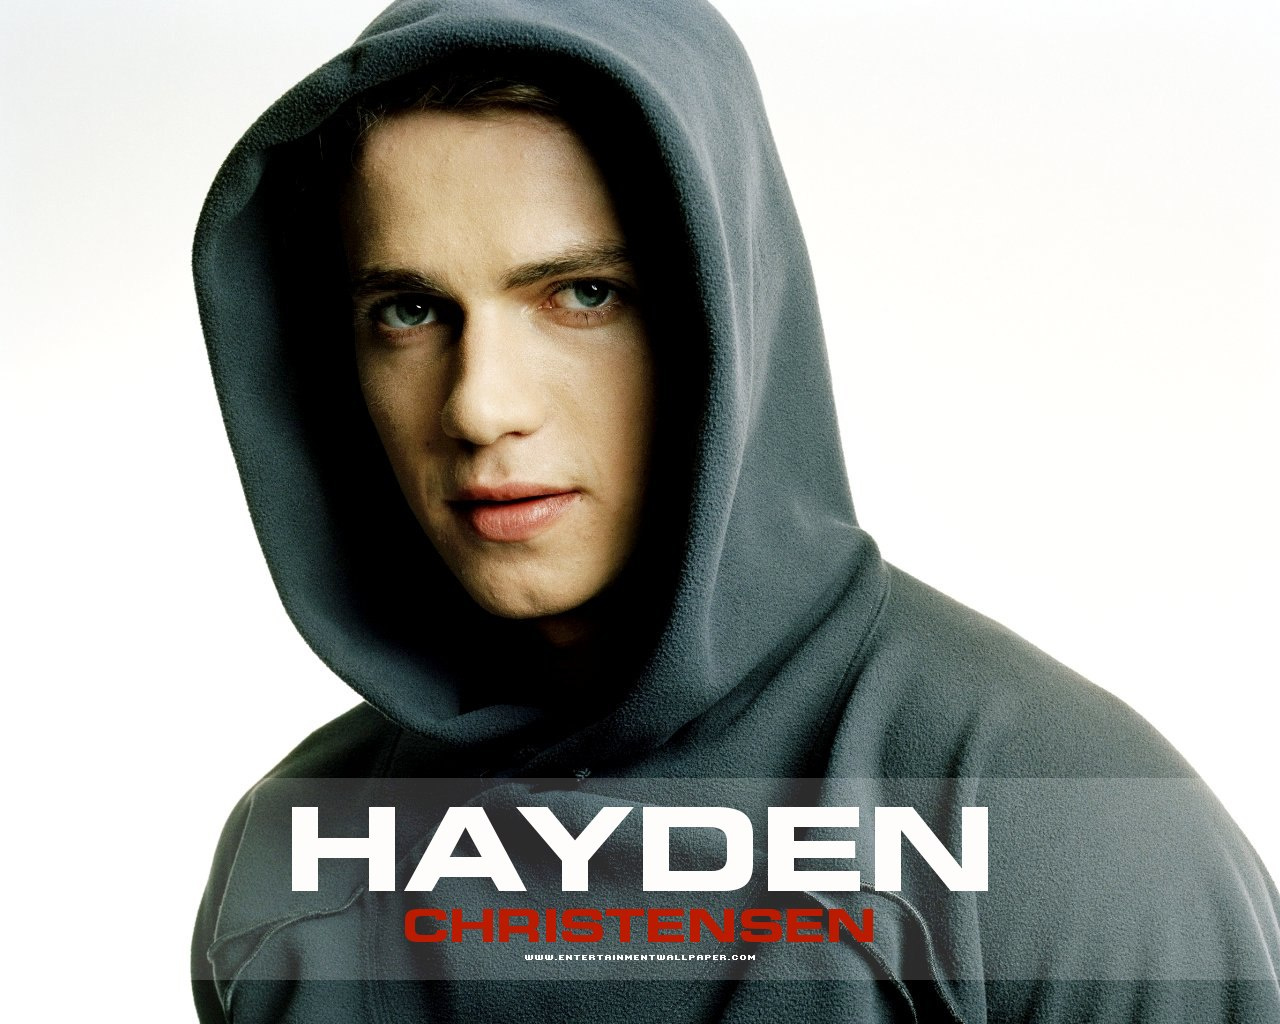 hindu single men in hayden Meet single women in hayden id online & chat in the forums dhu is a 100% free dating site to find single women in hayden.